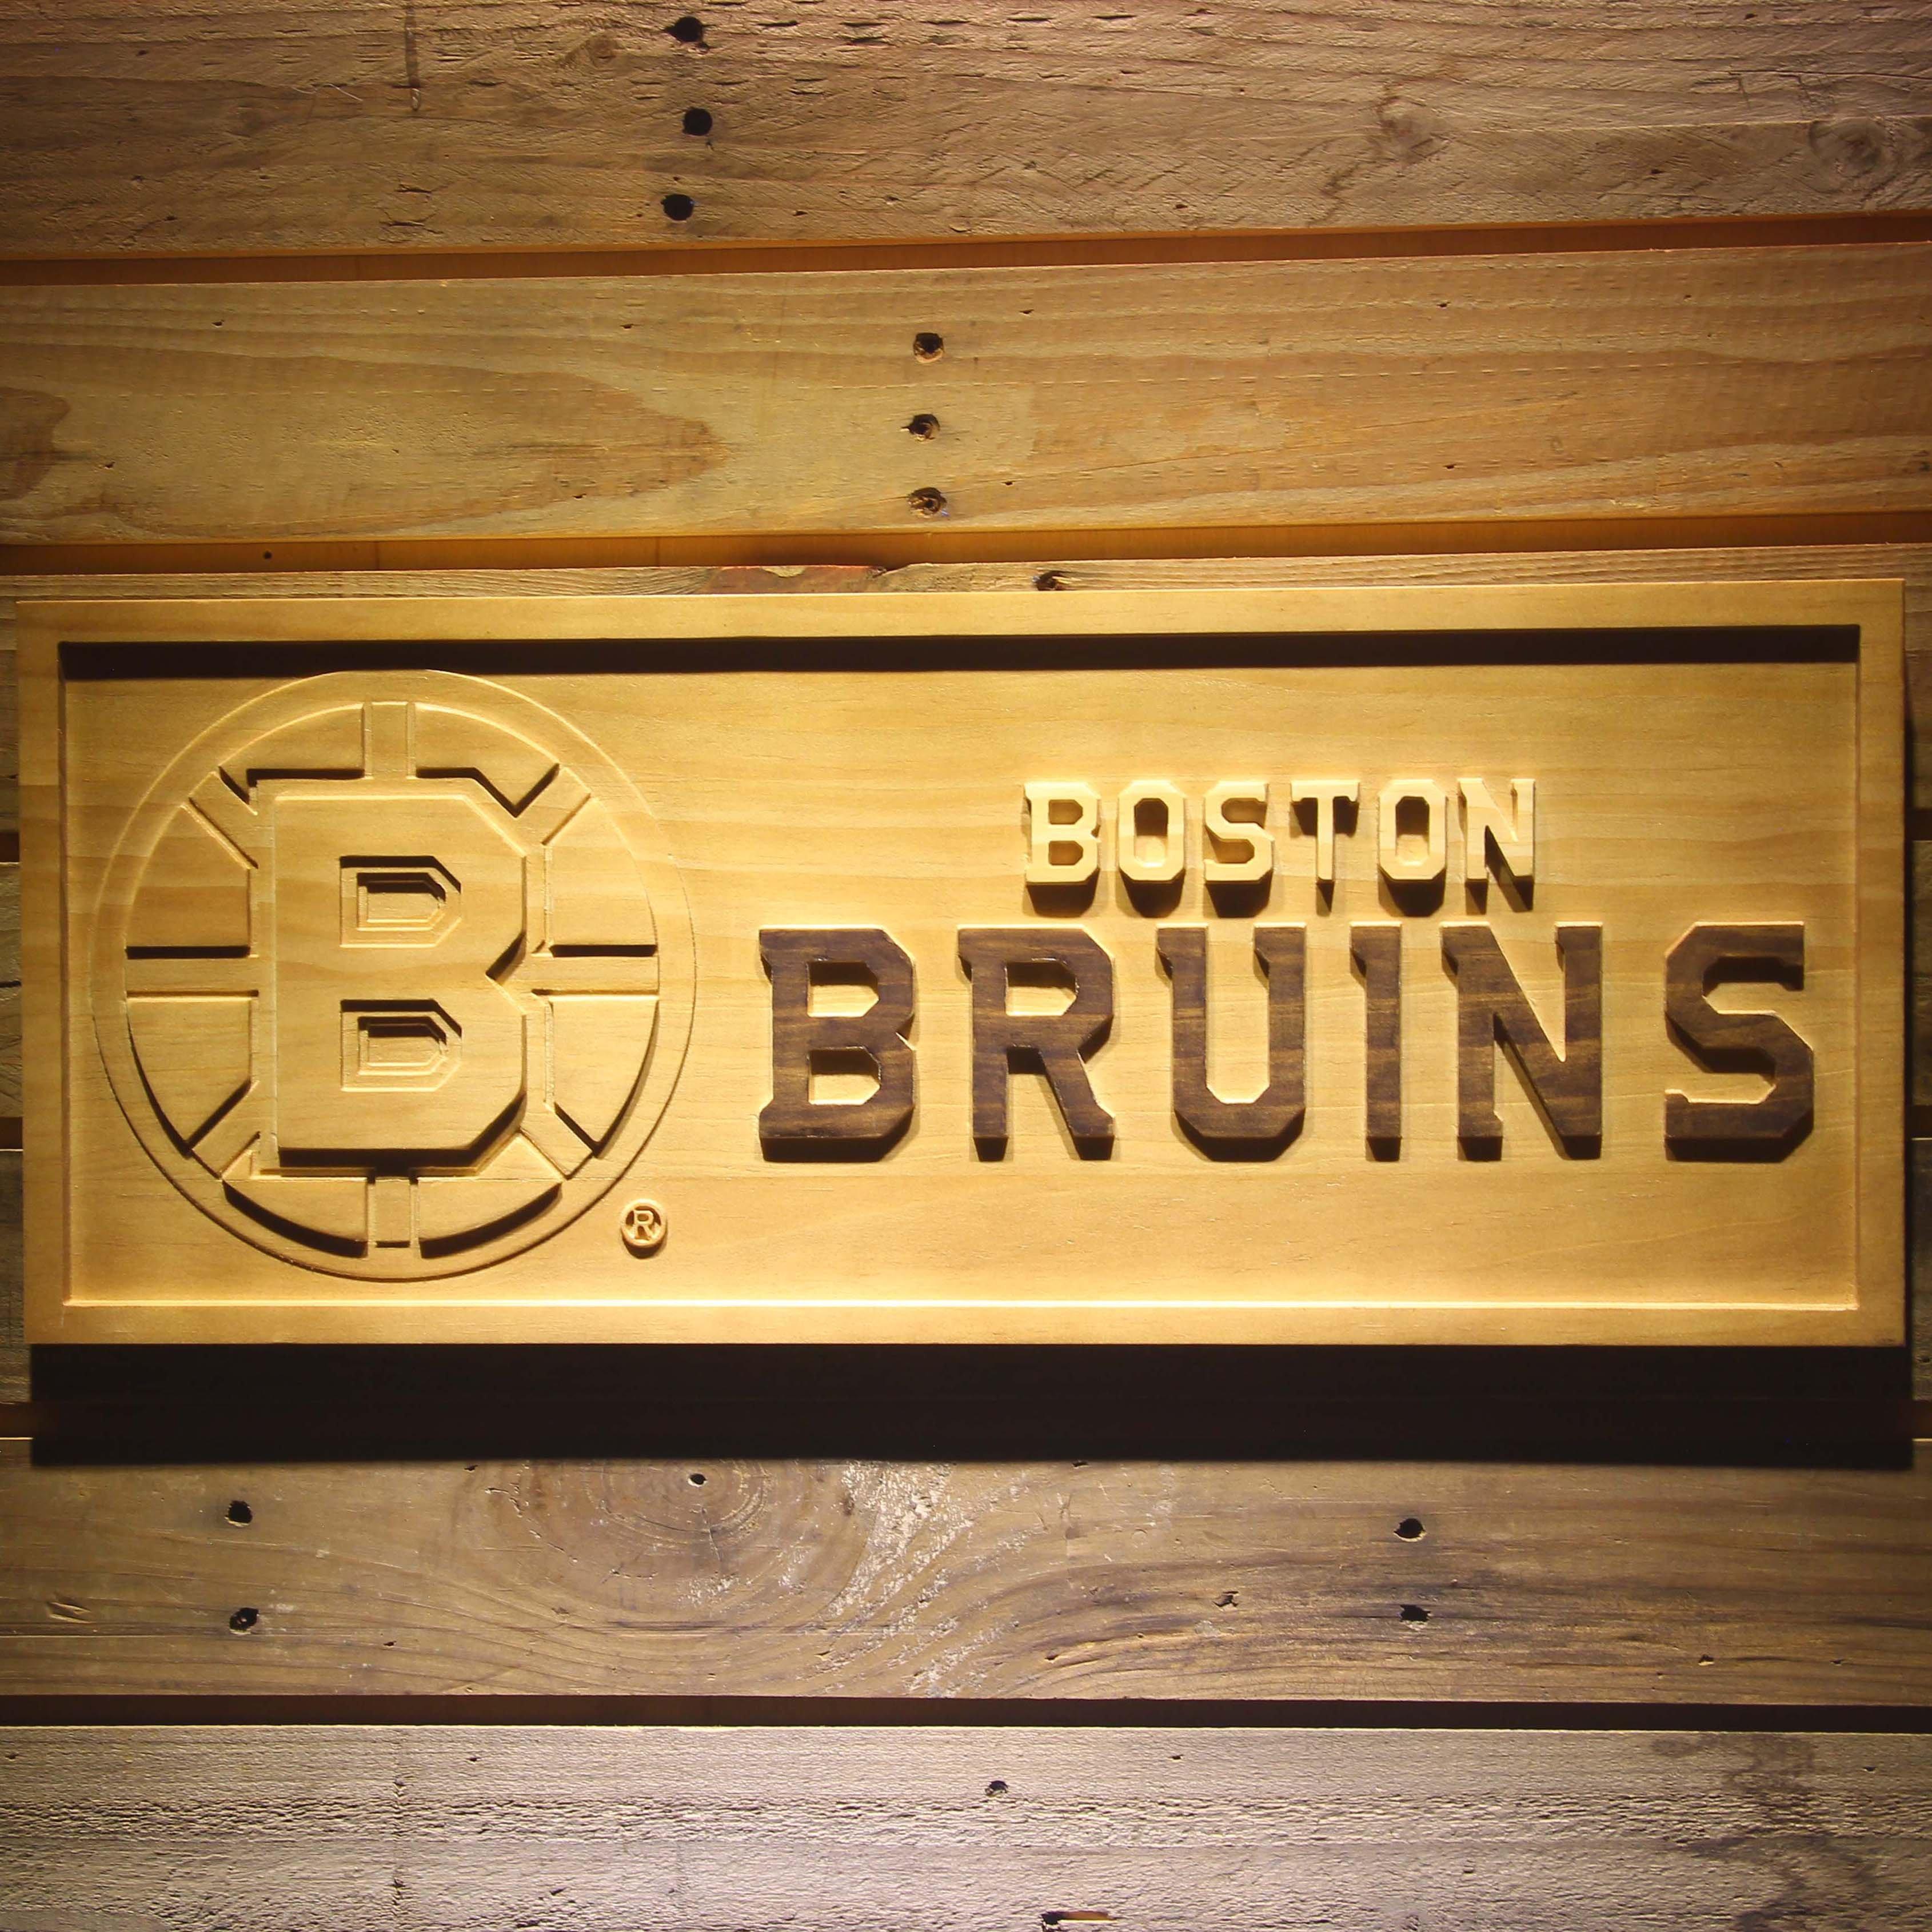 Boston Bruins 3d Wooden Engraved Nhl Team Logo Wooden Signs Boston Bruins Wooden